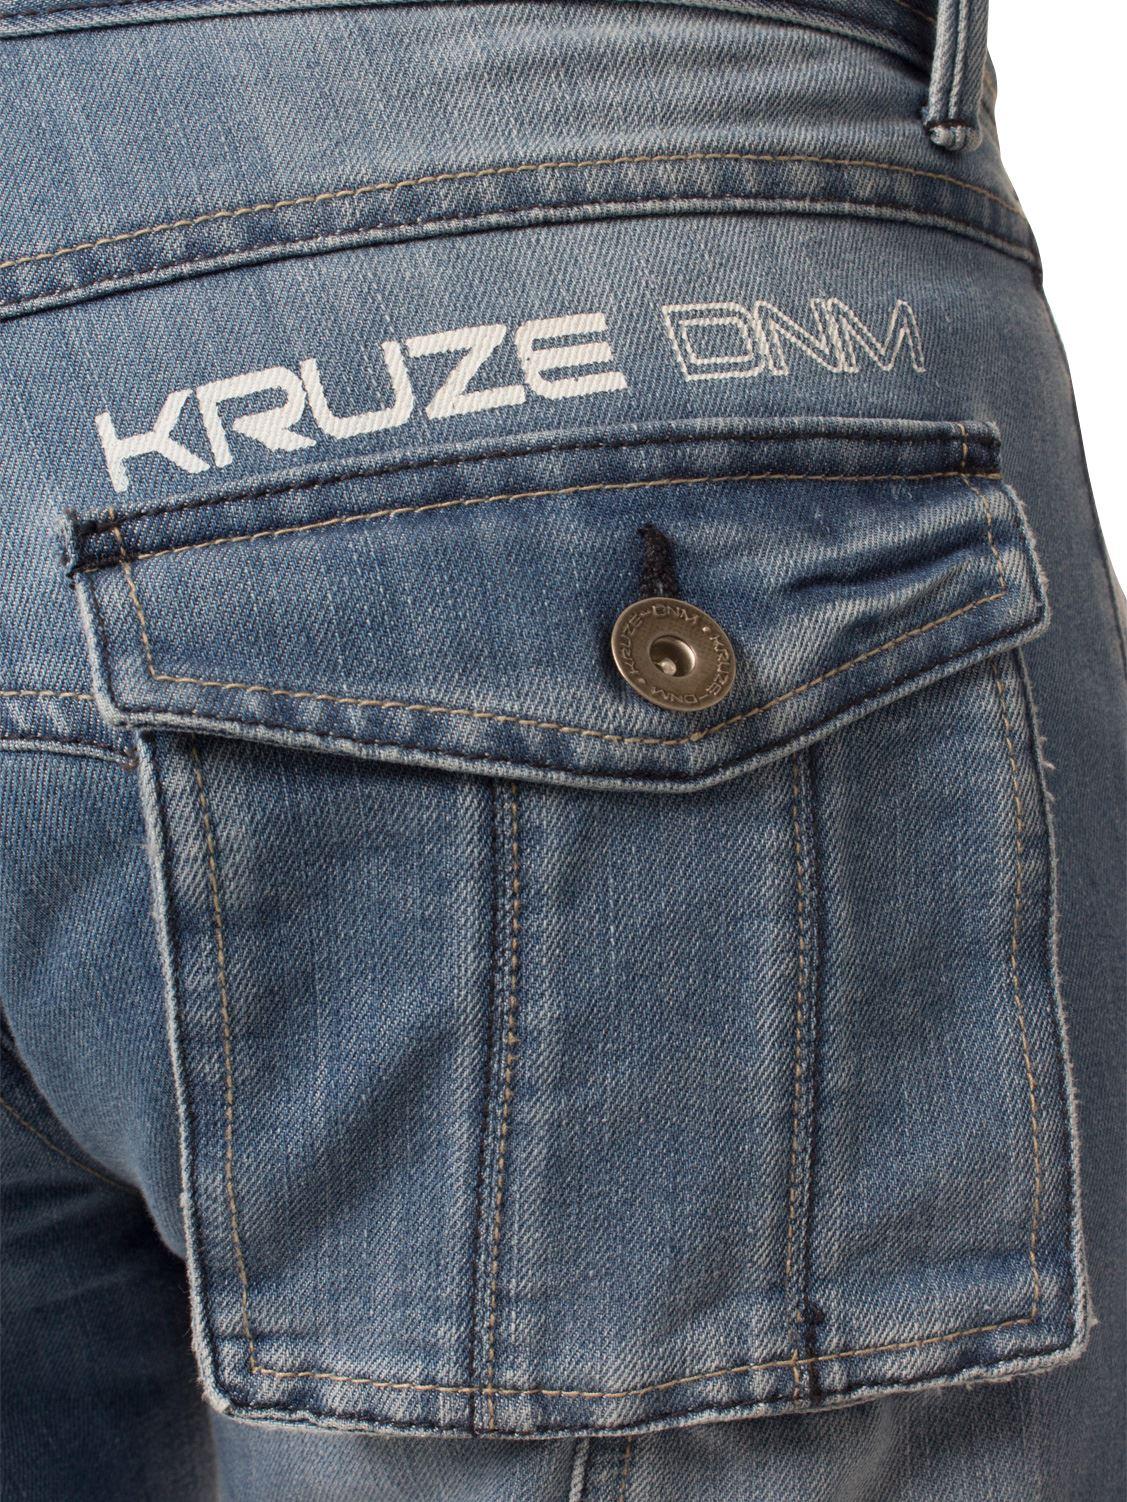 Mens-Jeans-Combate-Carga-Informal-Kruze-Trabajo-Pantalones-Cintura-Tallas-Denim-Pantalones-de-vestir miniatura 9